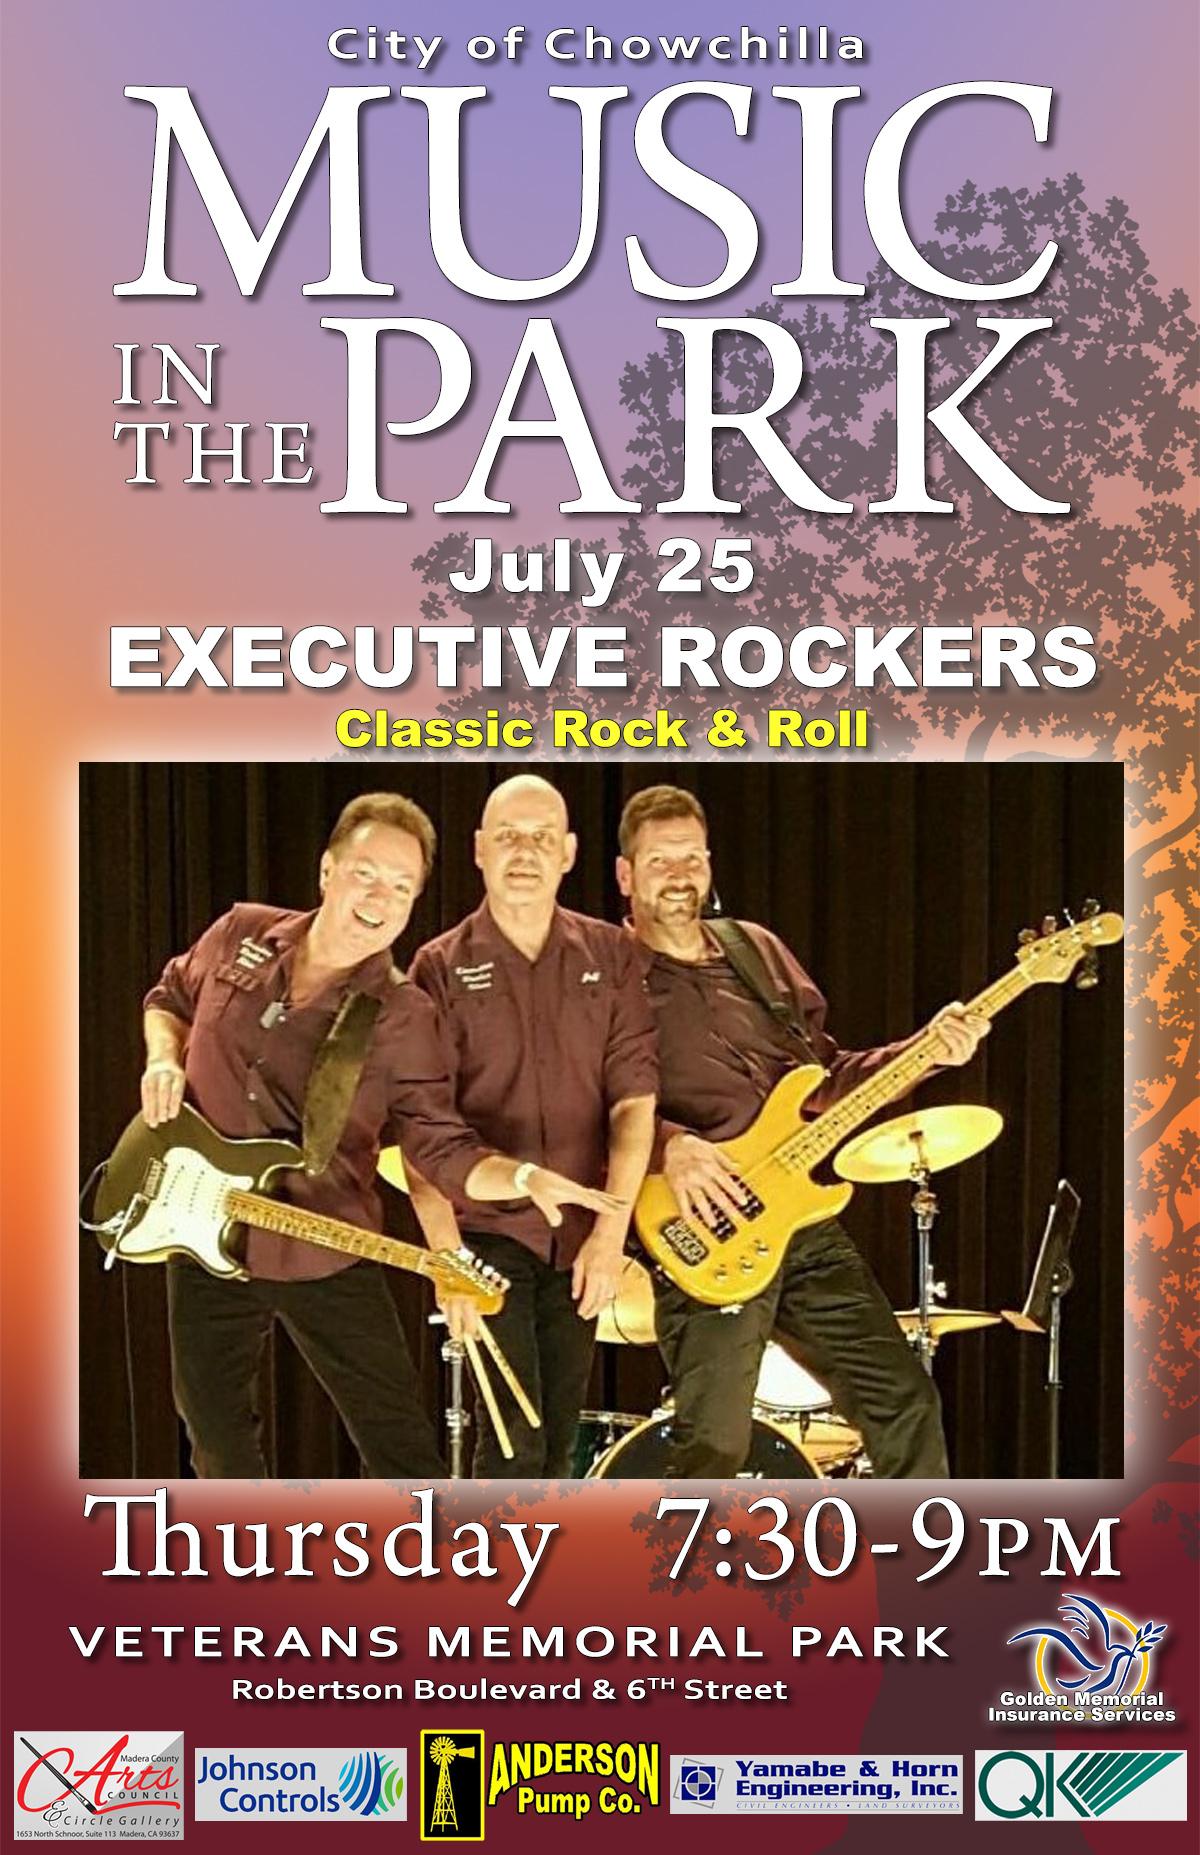 Social Media Concert Promo - Executive Rockers.jpg